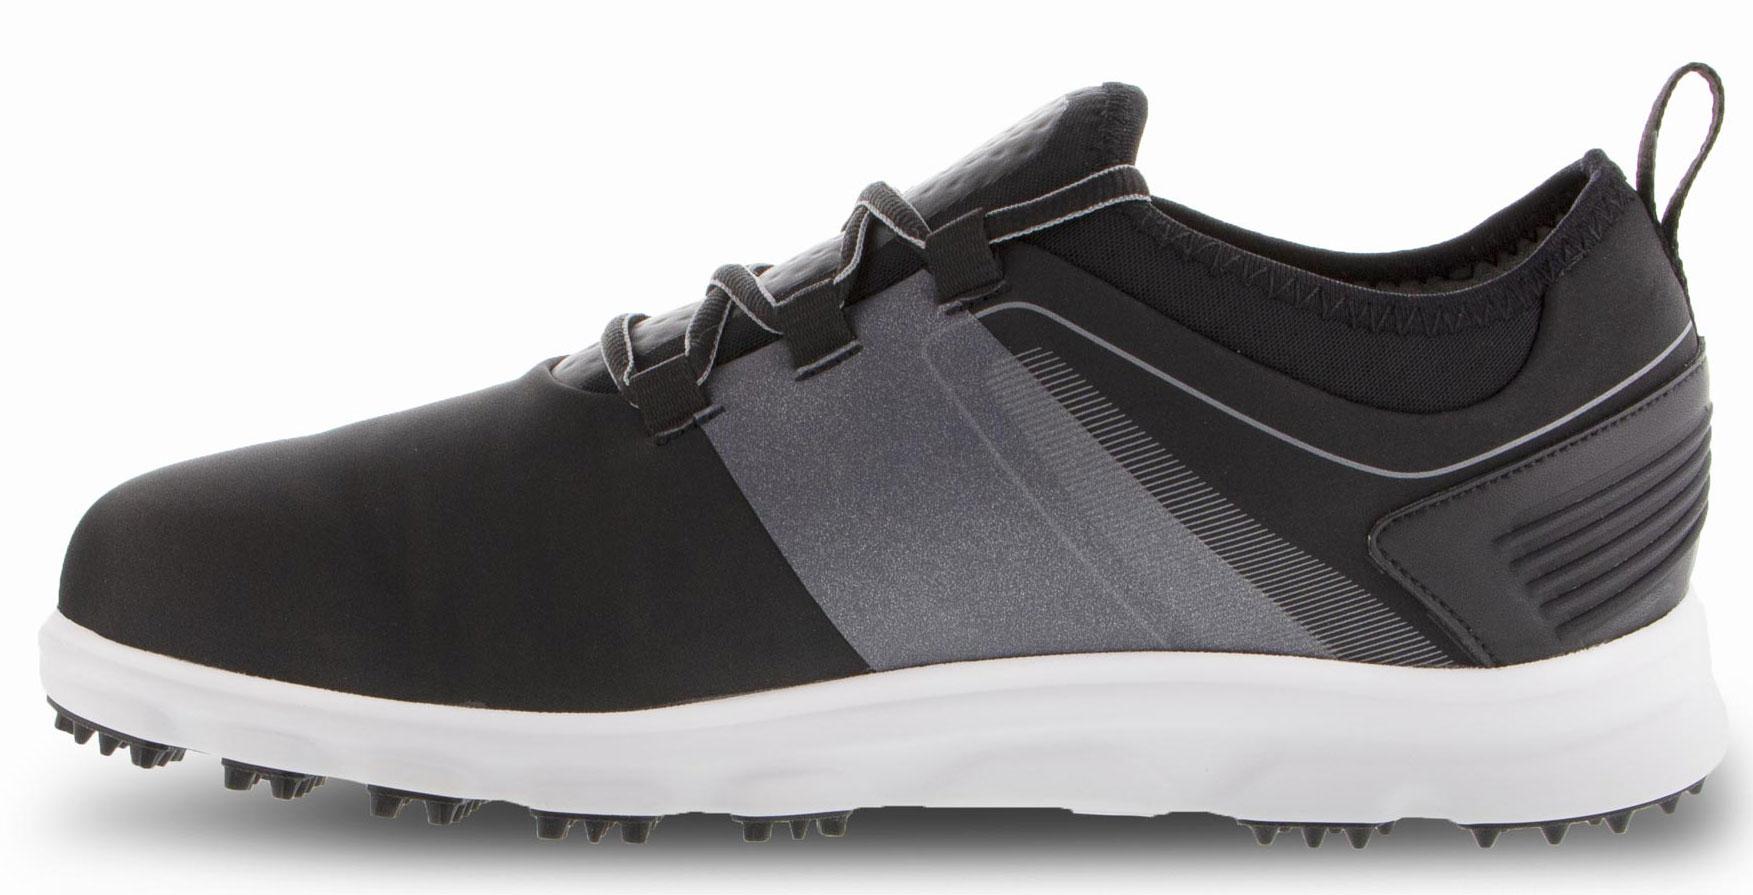 FootJoy-Superlites-XP-Golf-Shoes-Men-039-s-New thumbnail 4